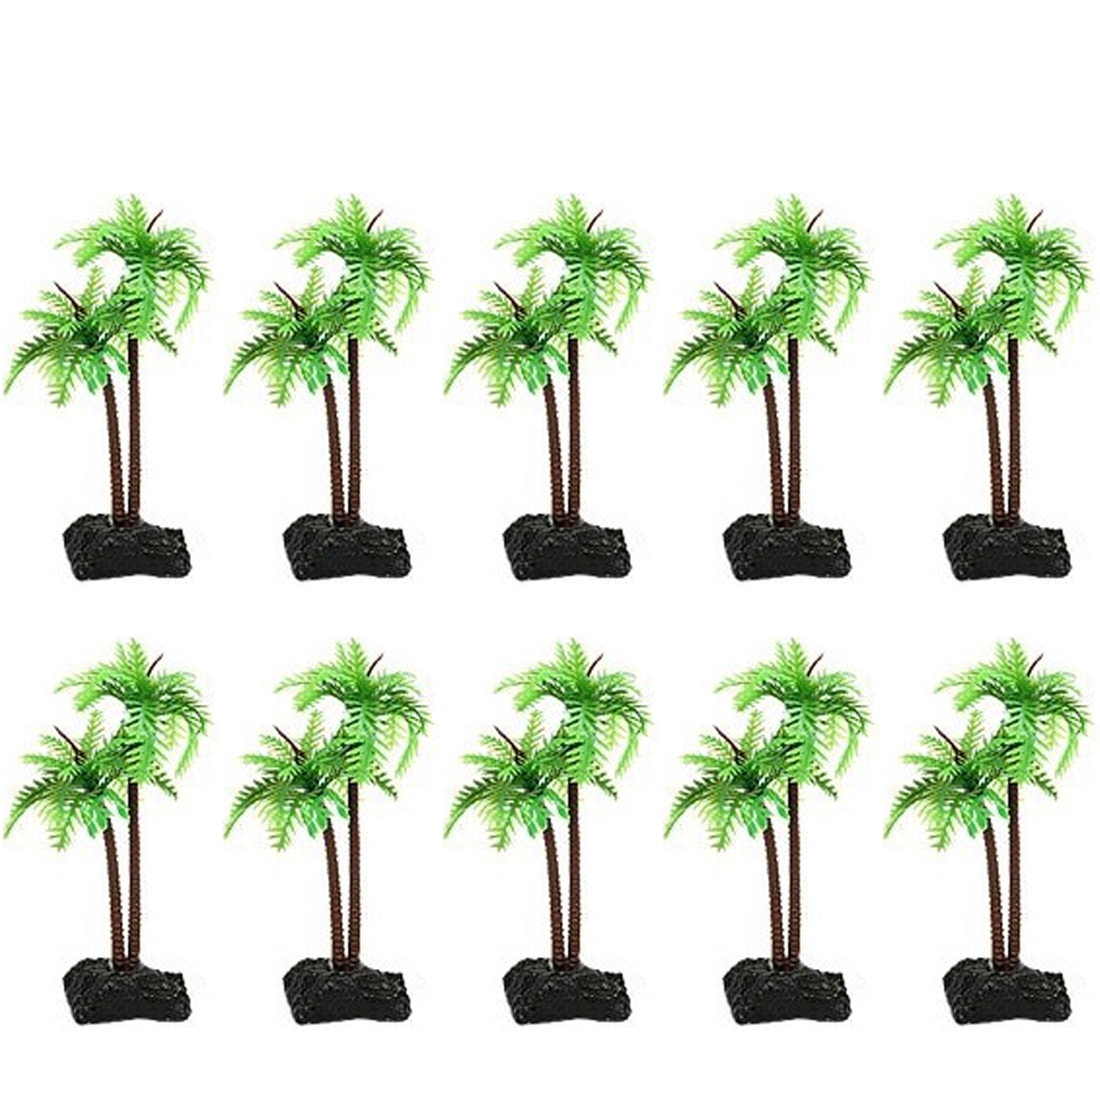 10Pcs Artificial Coconut Trees Landscaping with Medium Base for Fish Tank Fake Mountain Bonsai Decor - Green